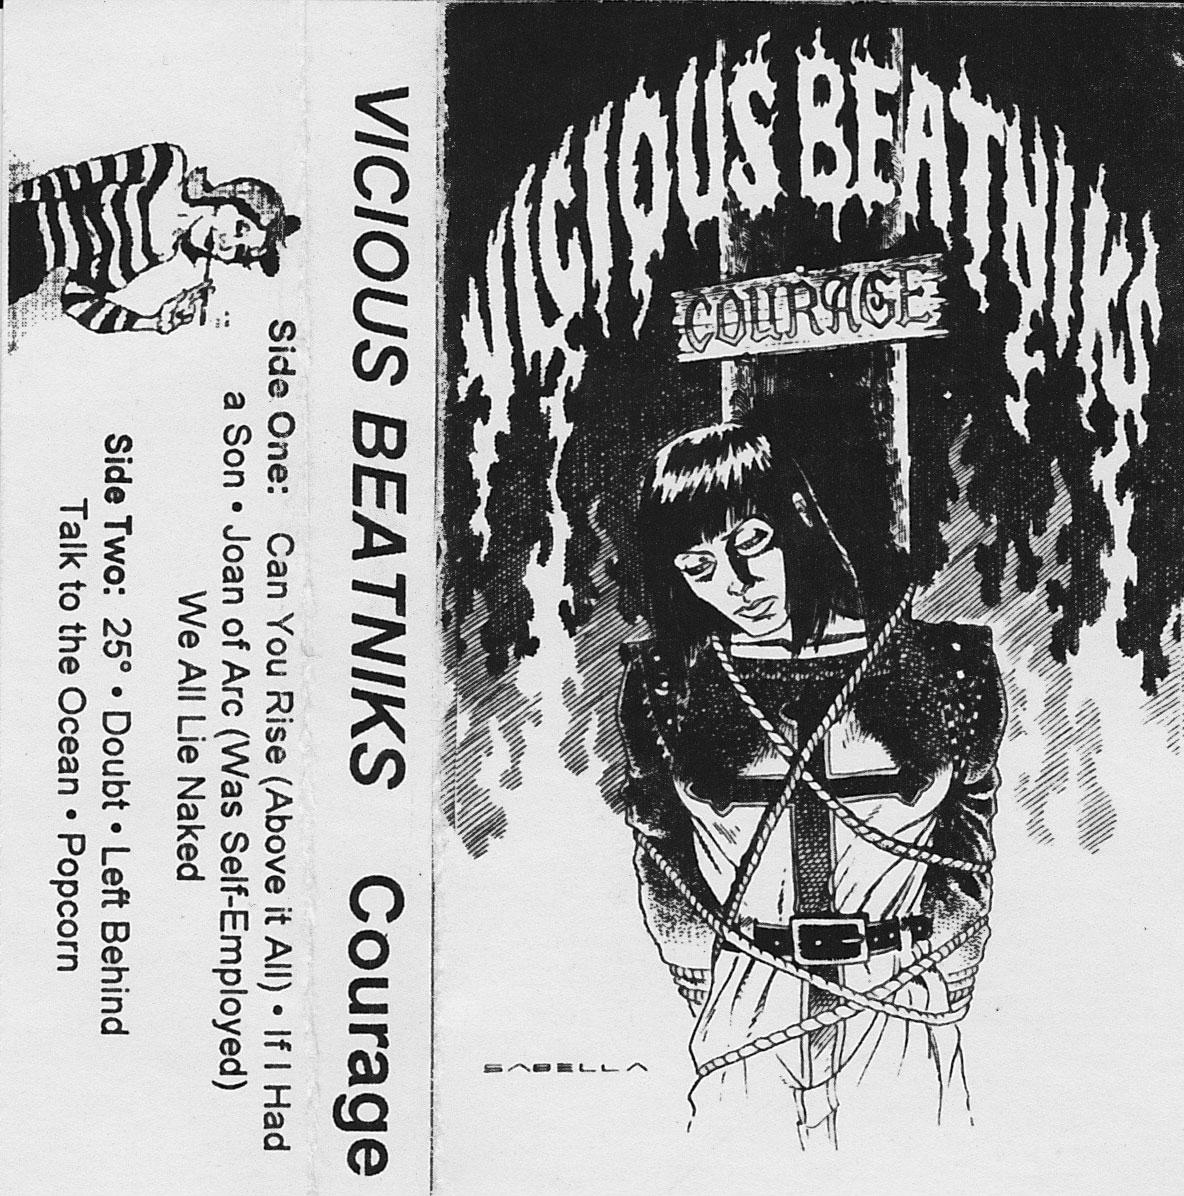 Vicious Beatniks: Courage, 1992